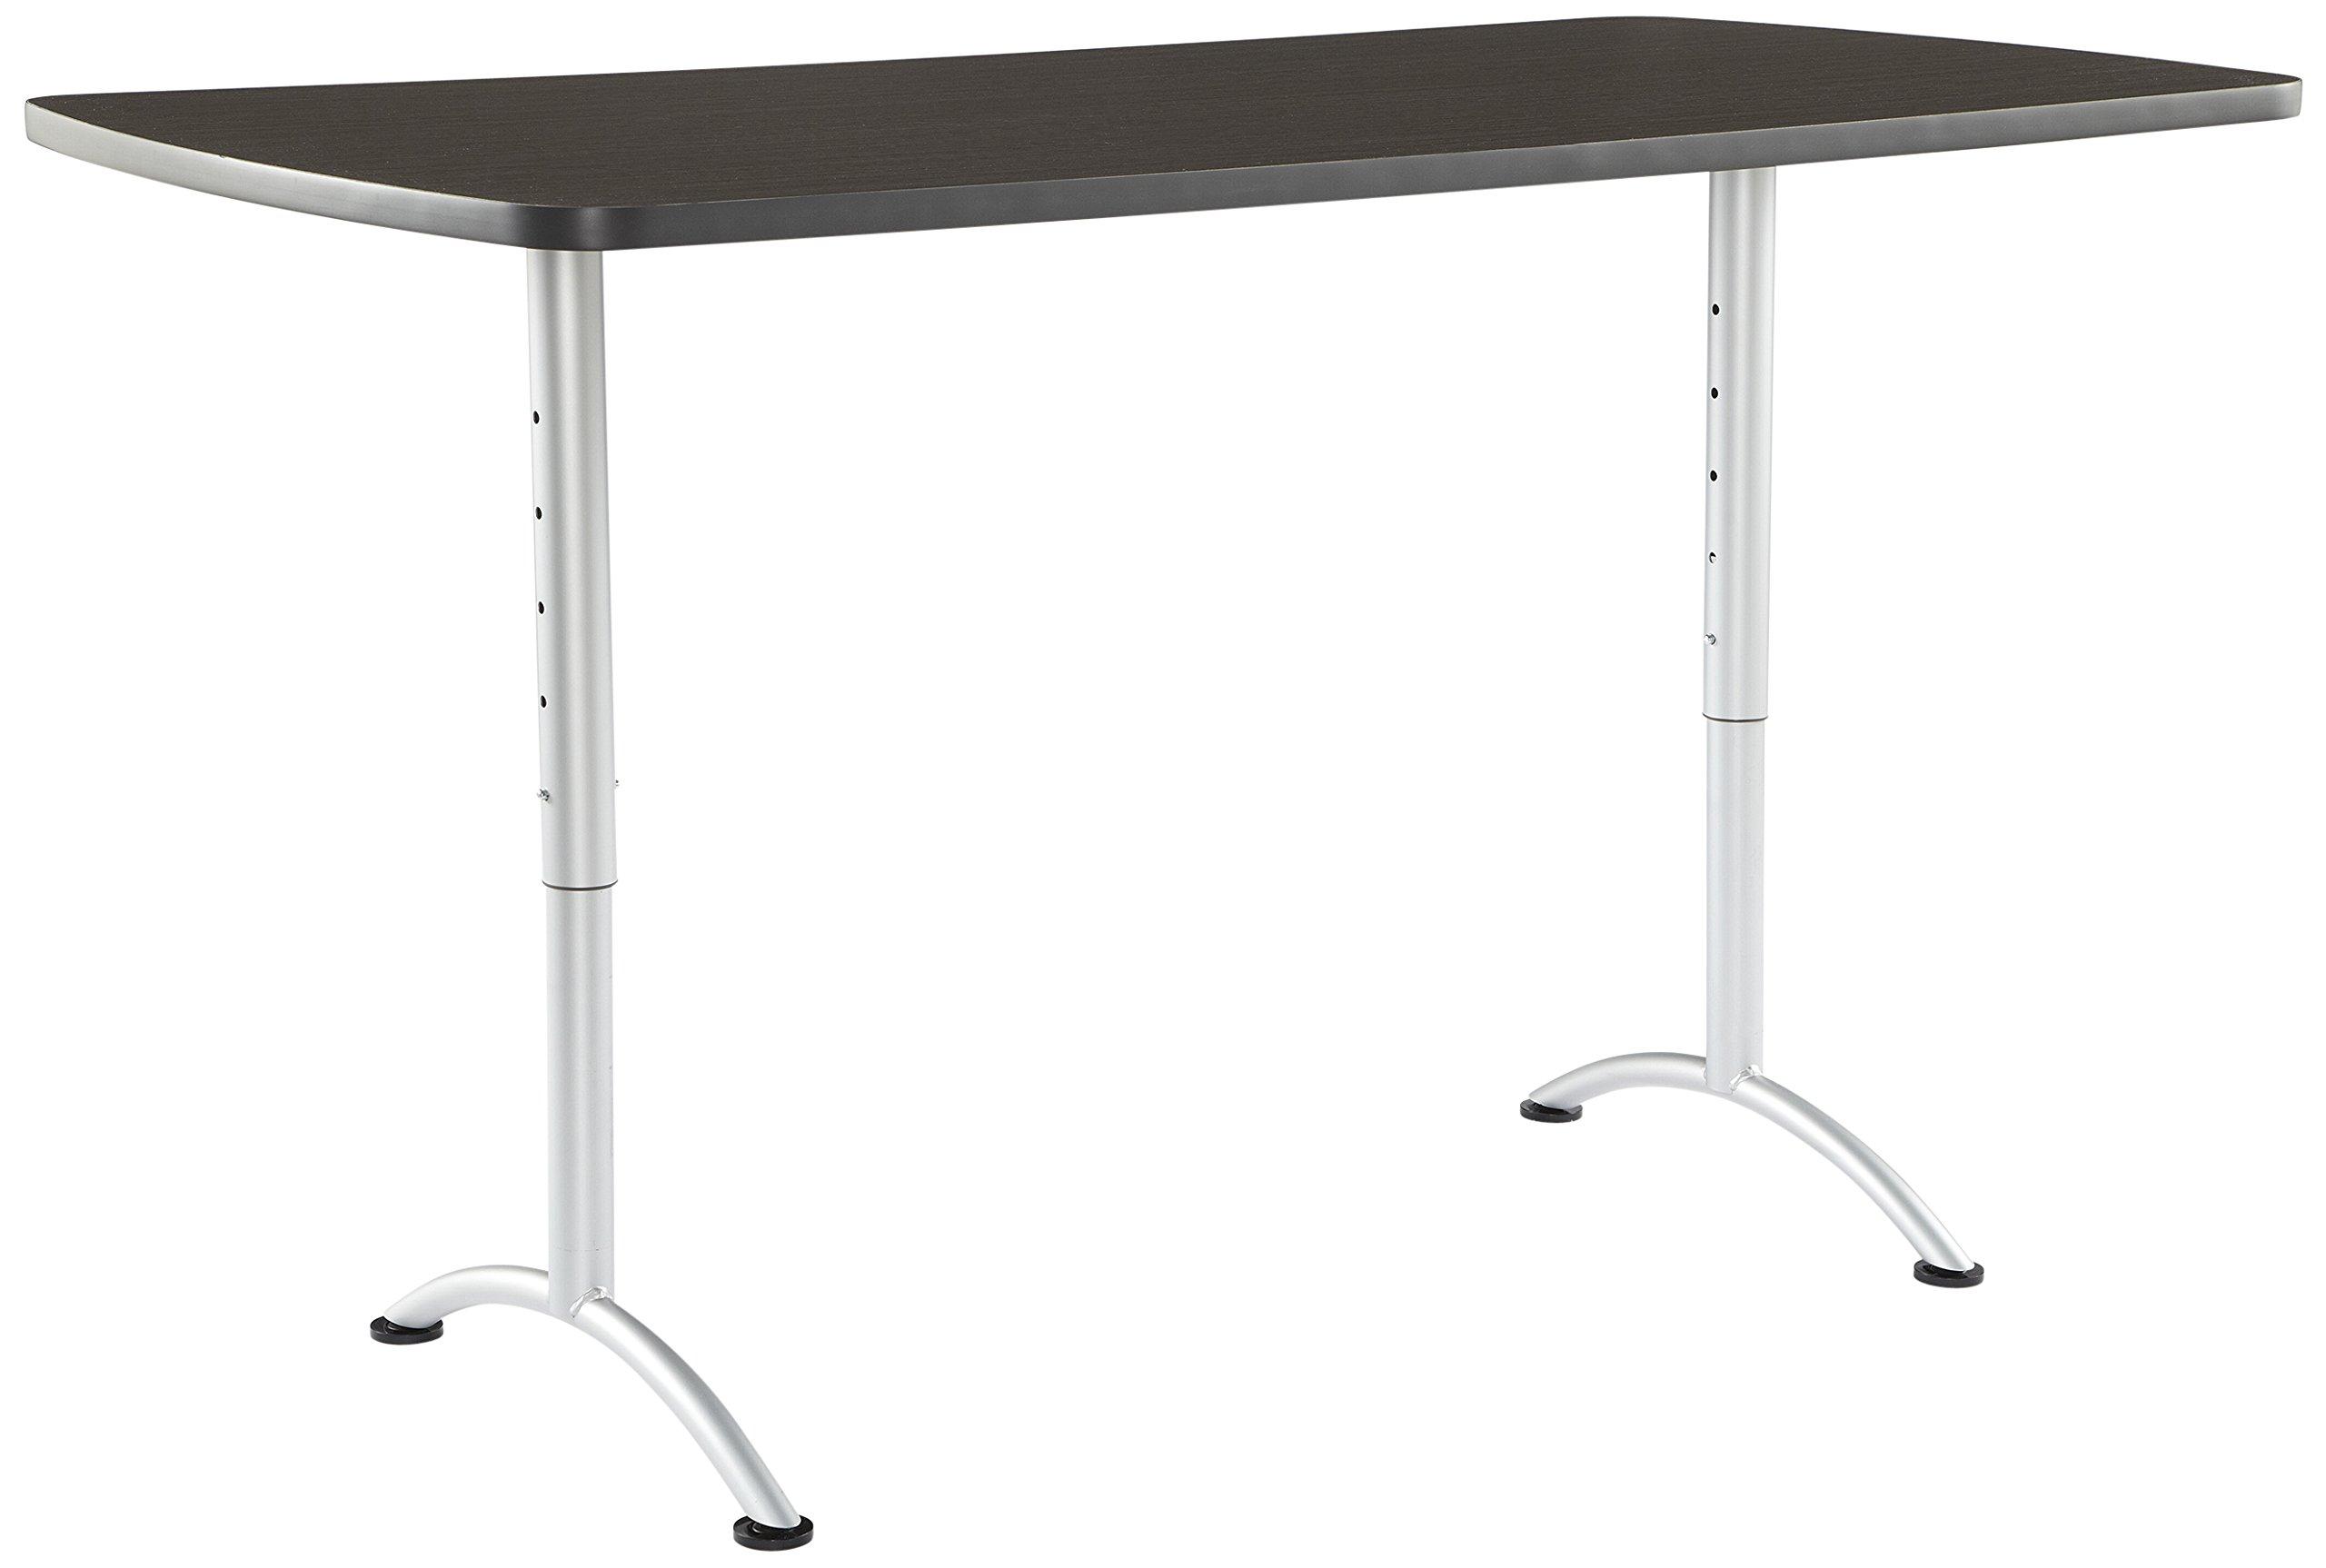 Iceberg ICE69325 ARC 6-foot Adjustable Height Rectangular Conference Table, 36'' x 72'', Gray Walnut/Silver Leg by Iceberg (Image #2)